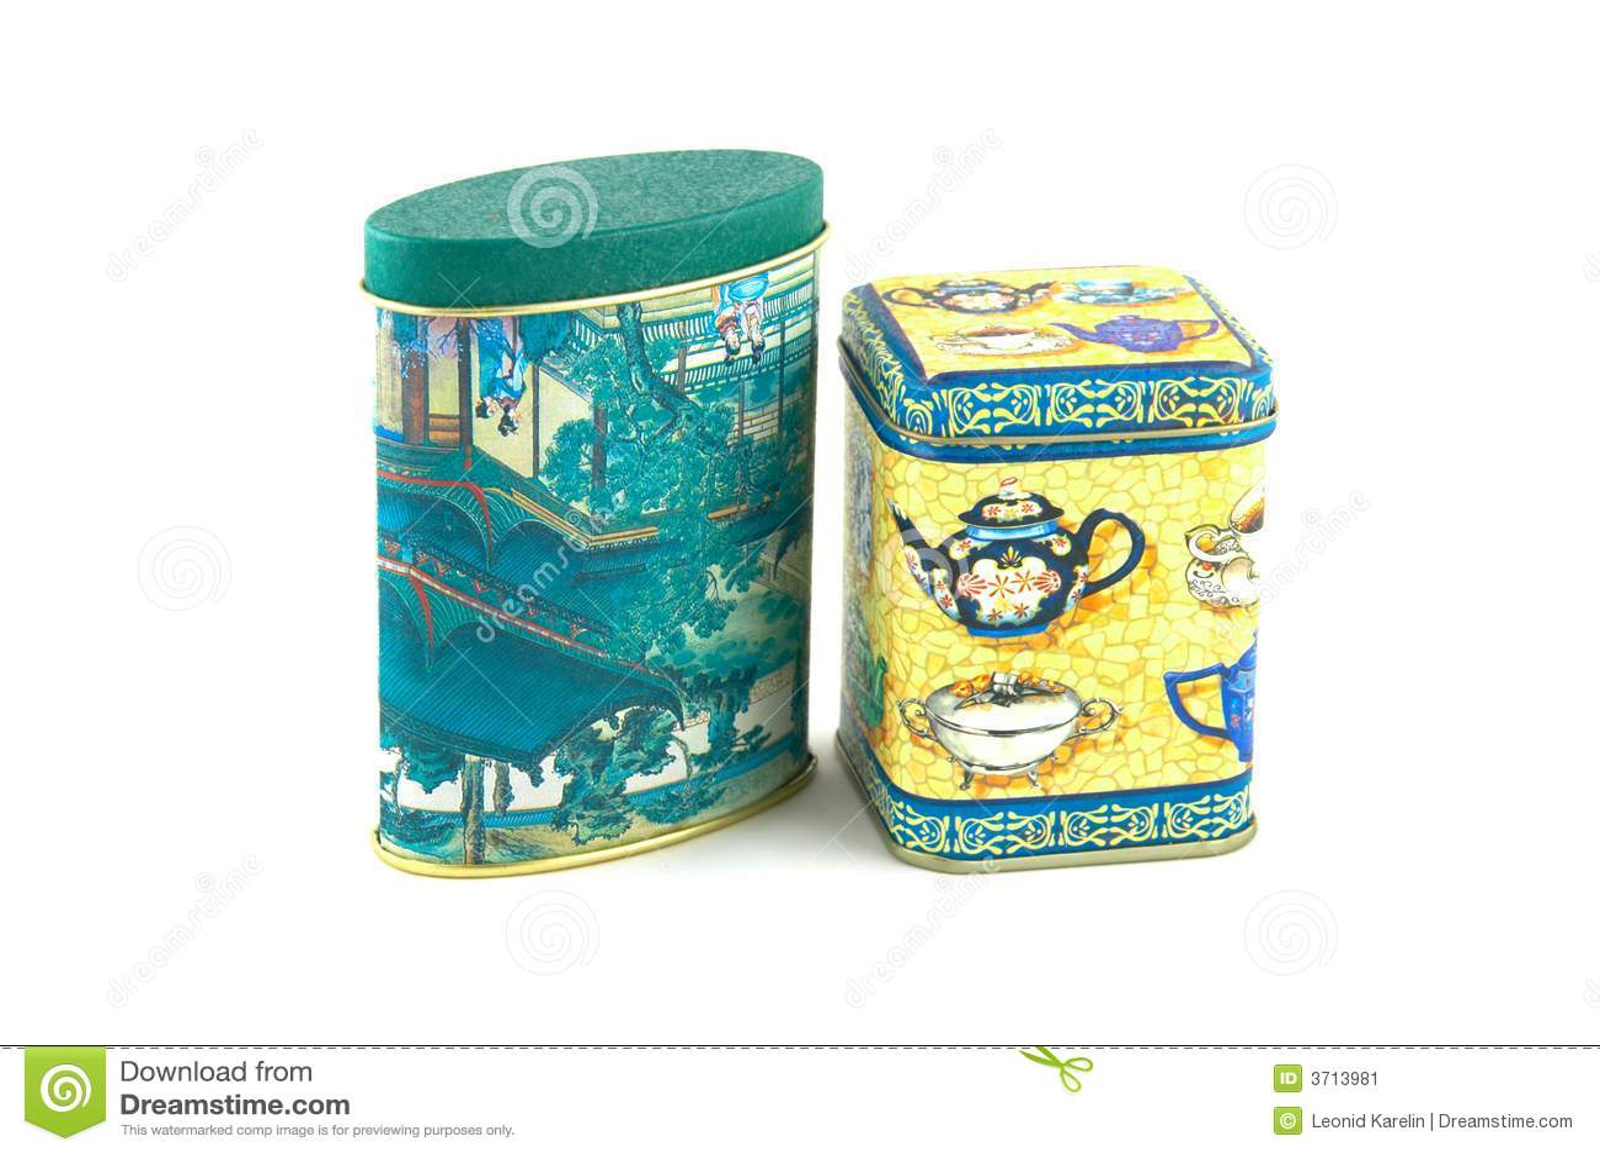 Tea box.